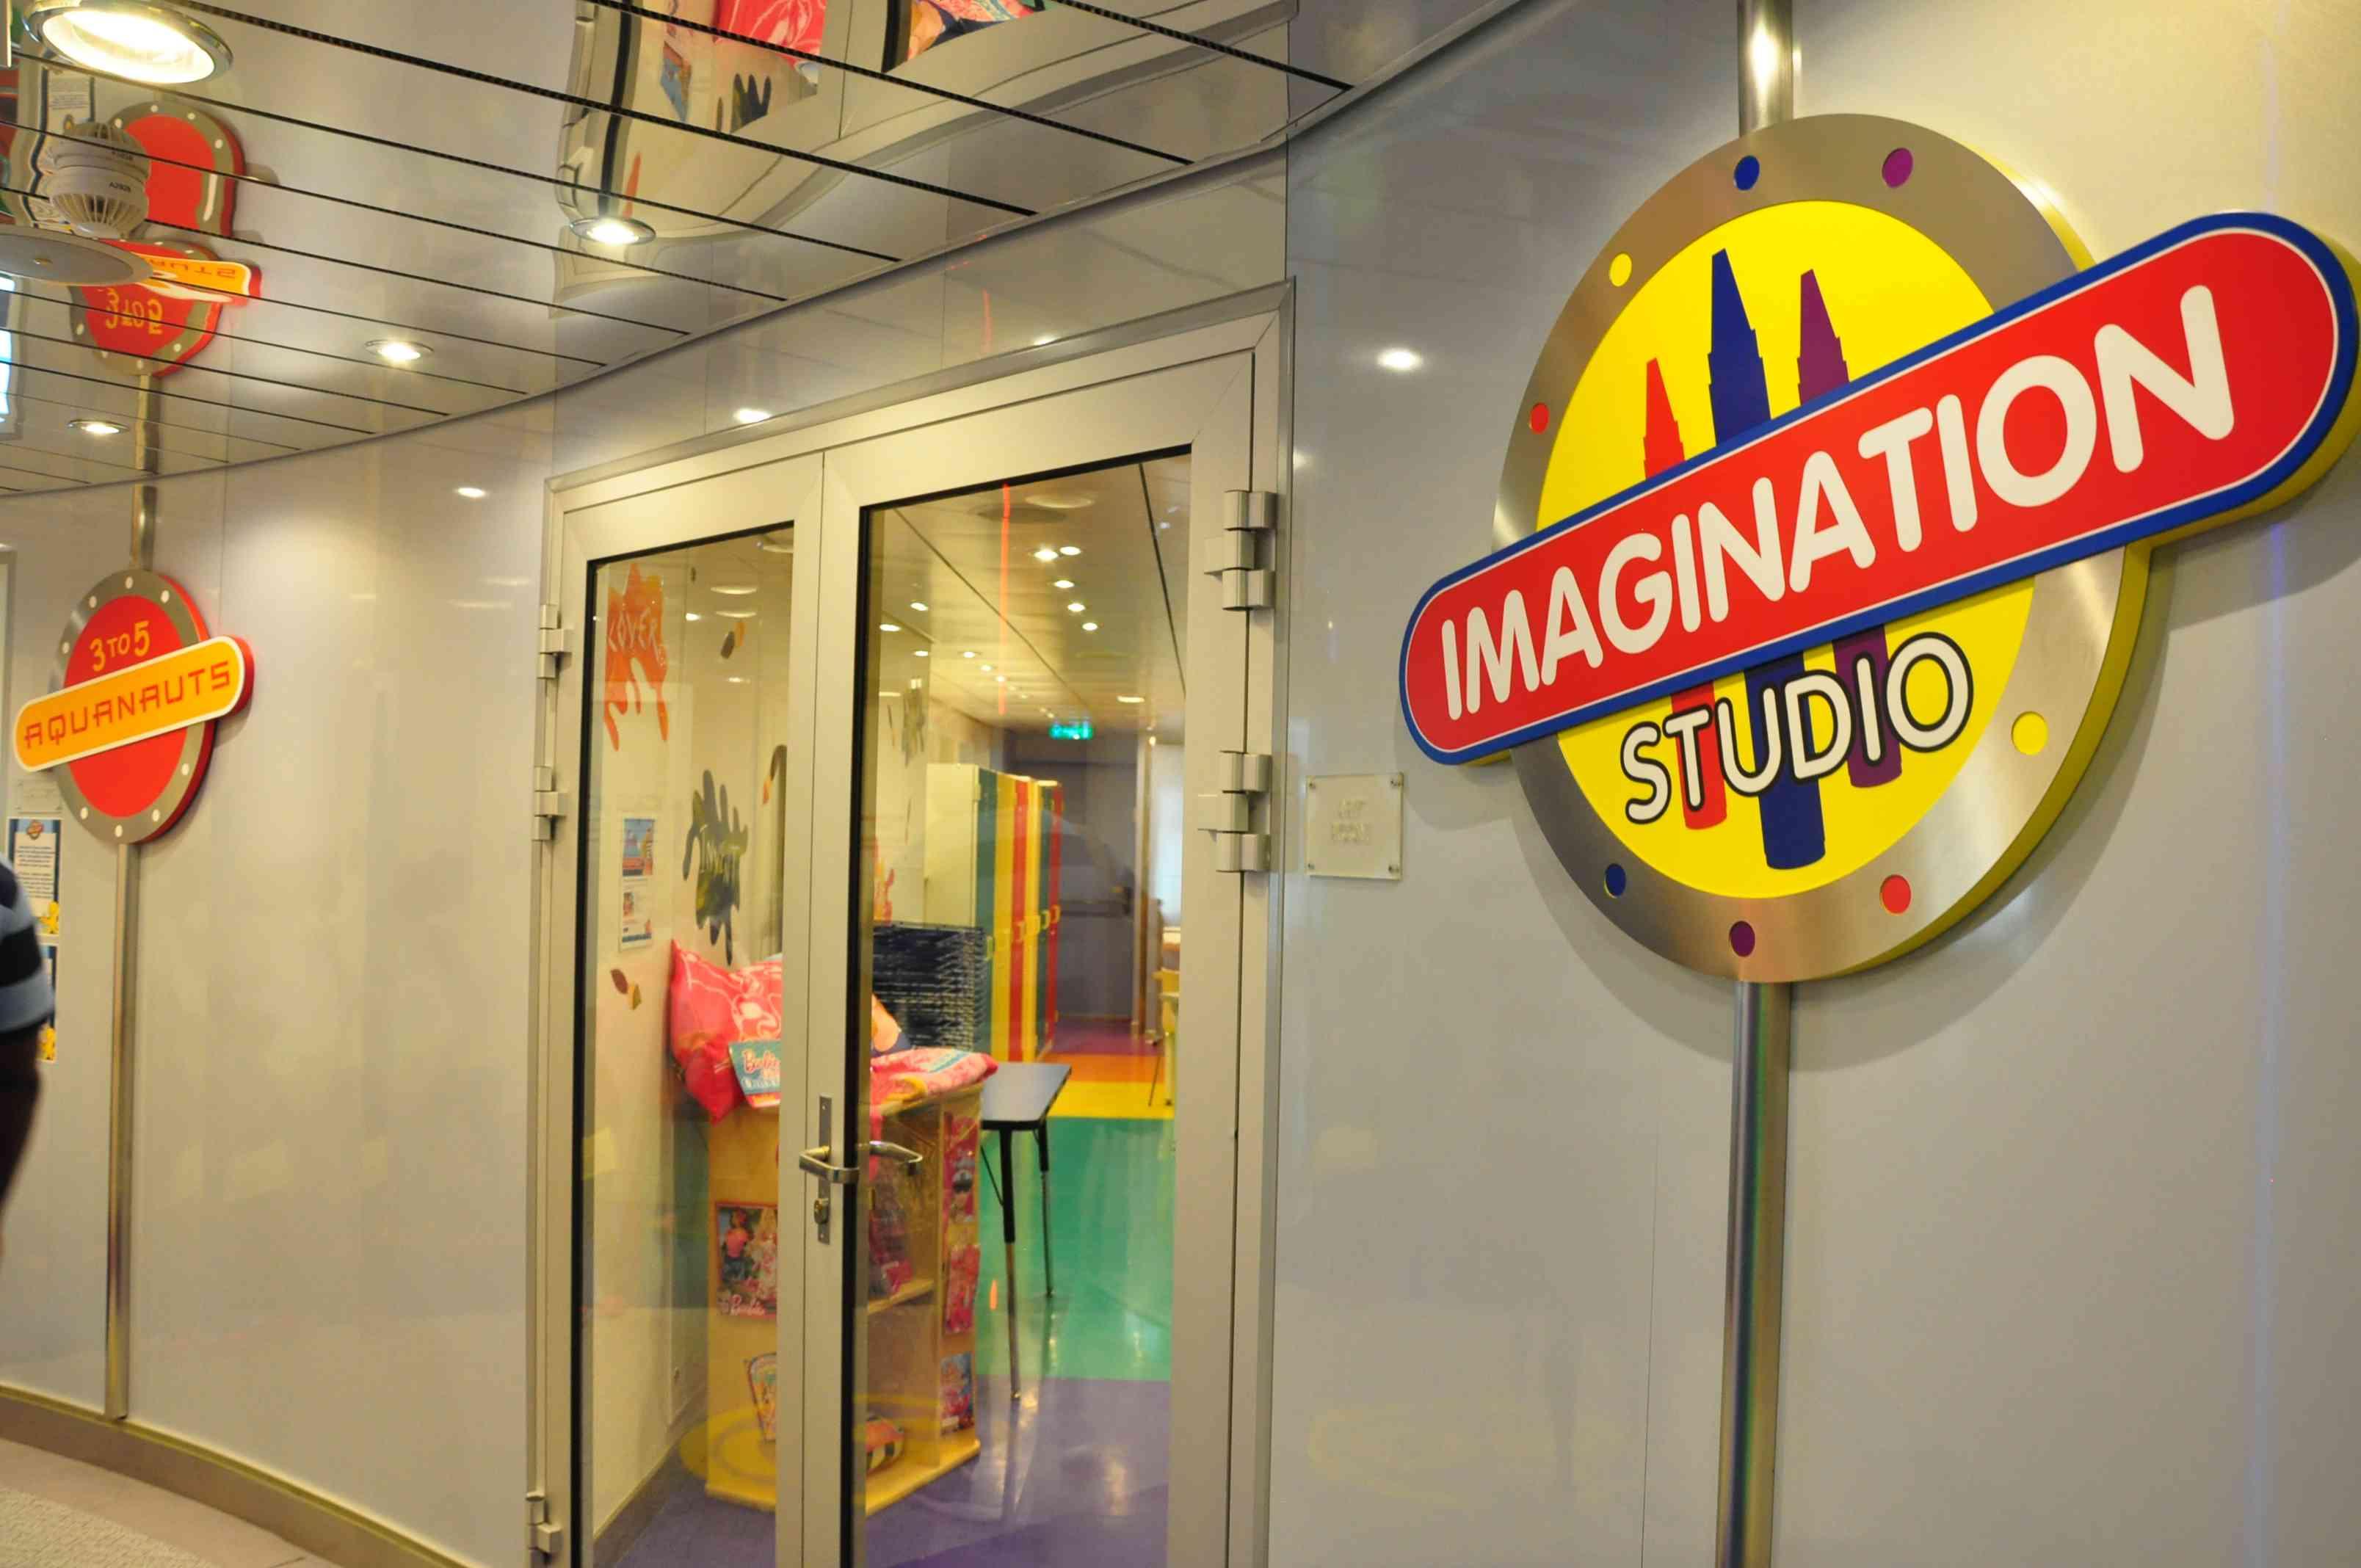 Oasis of the Seas imagination studio